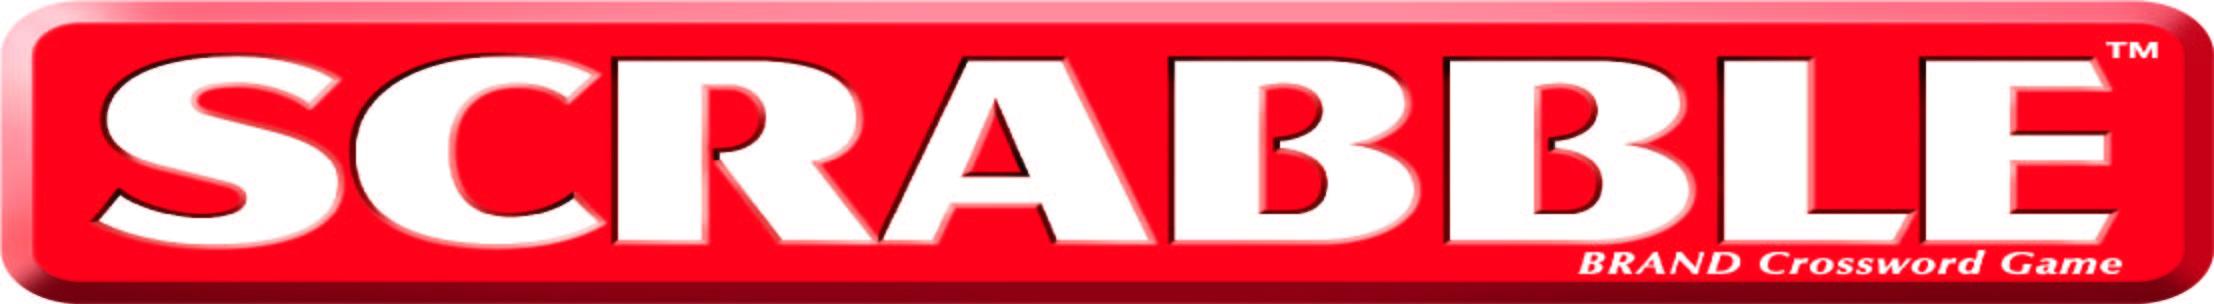 Scrabble clipart logo #4